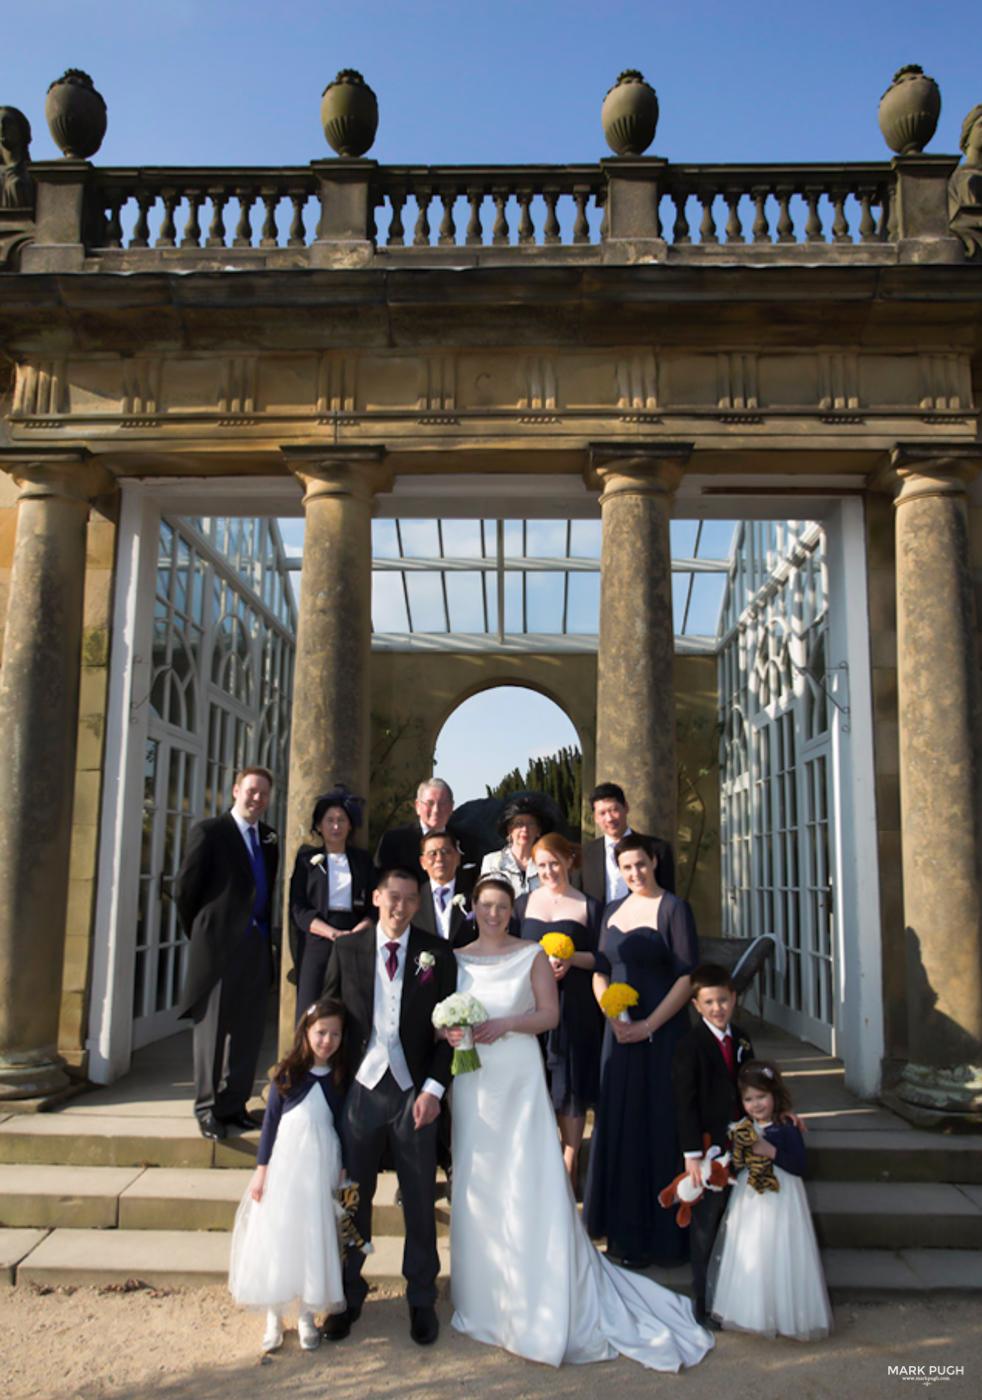 131  - Helen and Tim - Wedding Photography at Chatsworth House Bakewell Derbyshire DE45 1PP - Wedding Photographer Mark Pugh www.markpugh.com -173.JPG